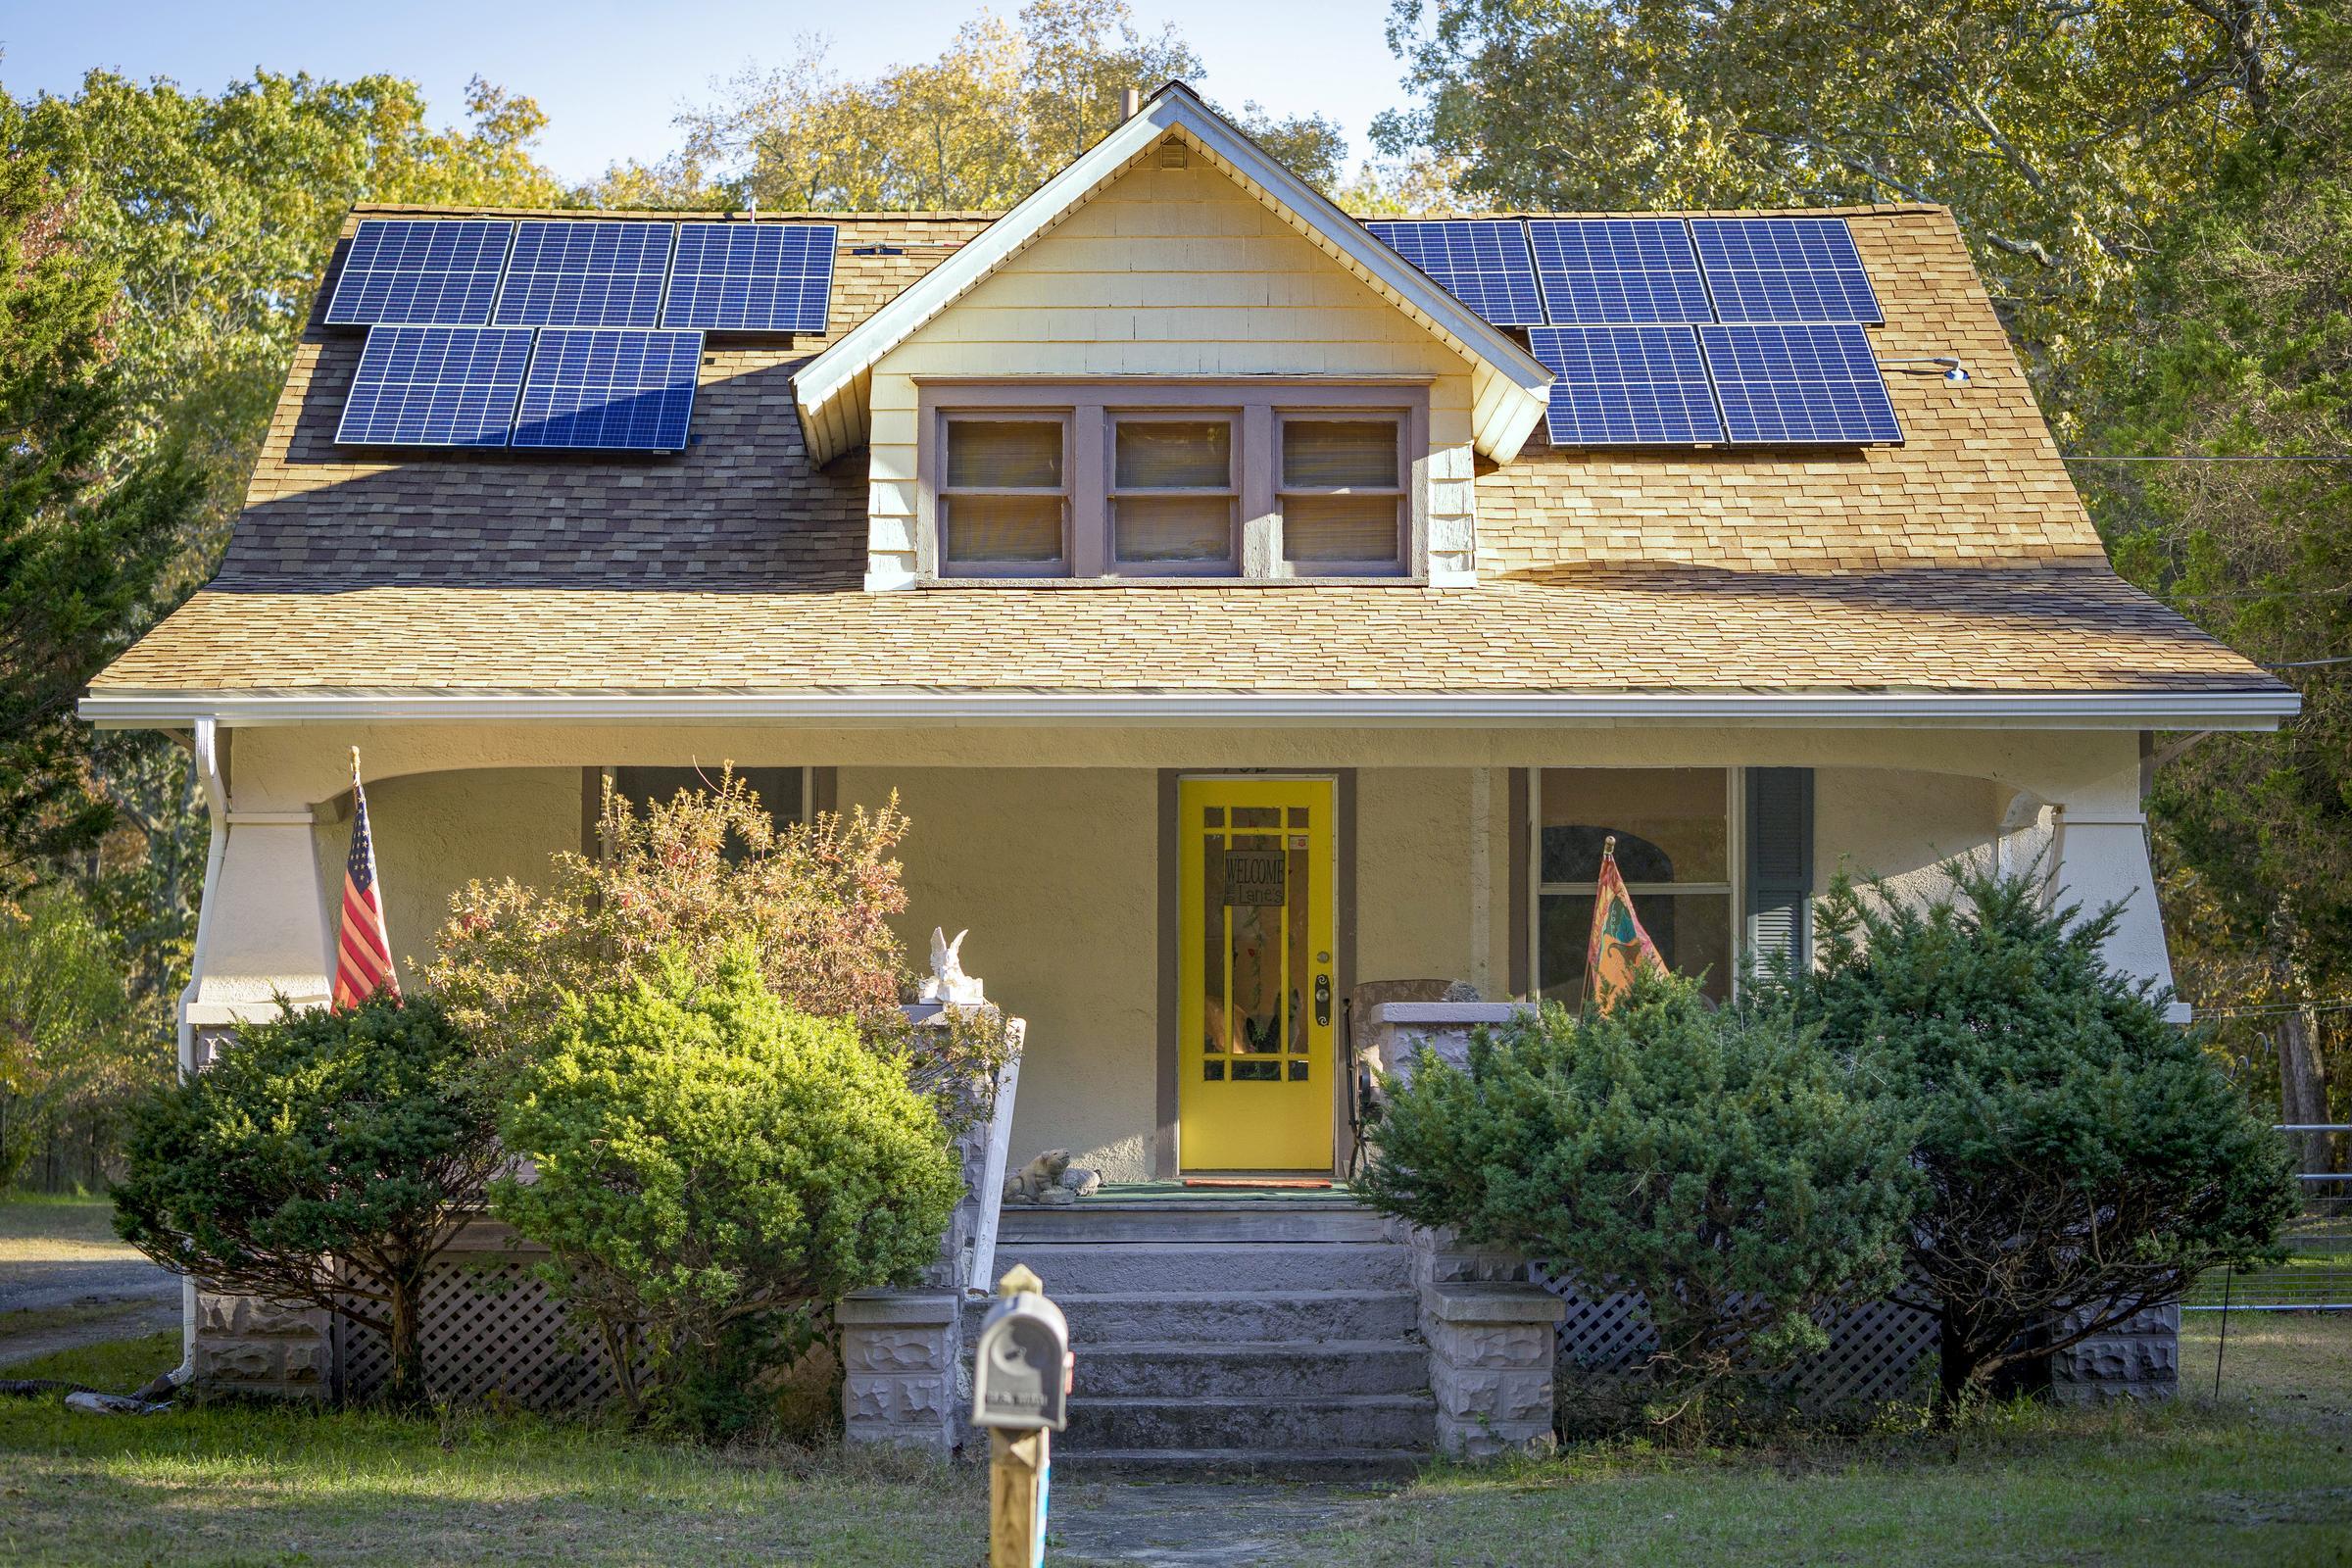 Advocates Condemn Indiana Move to Curb Solar